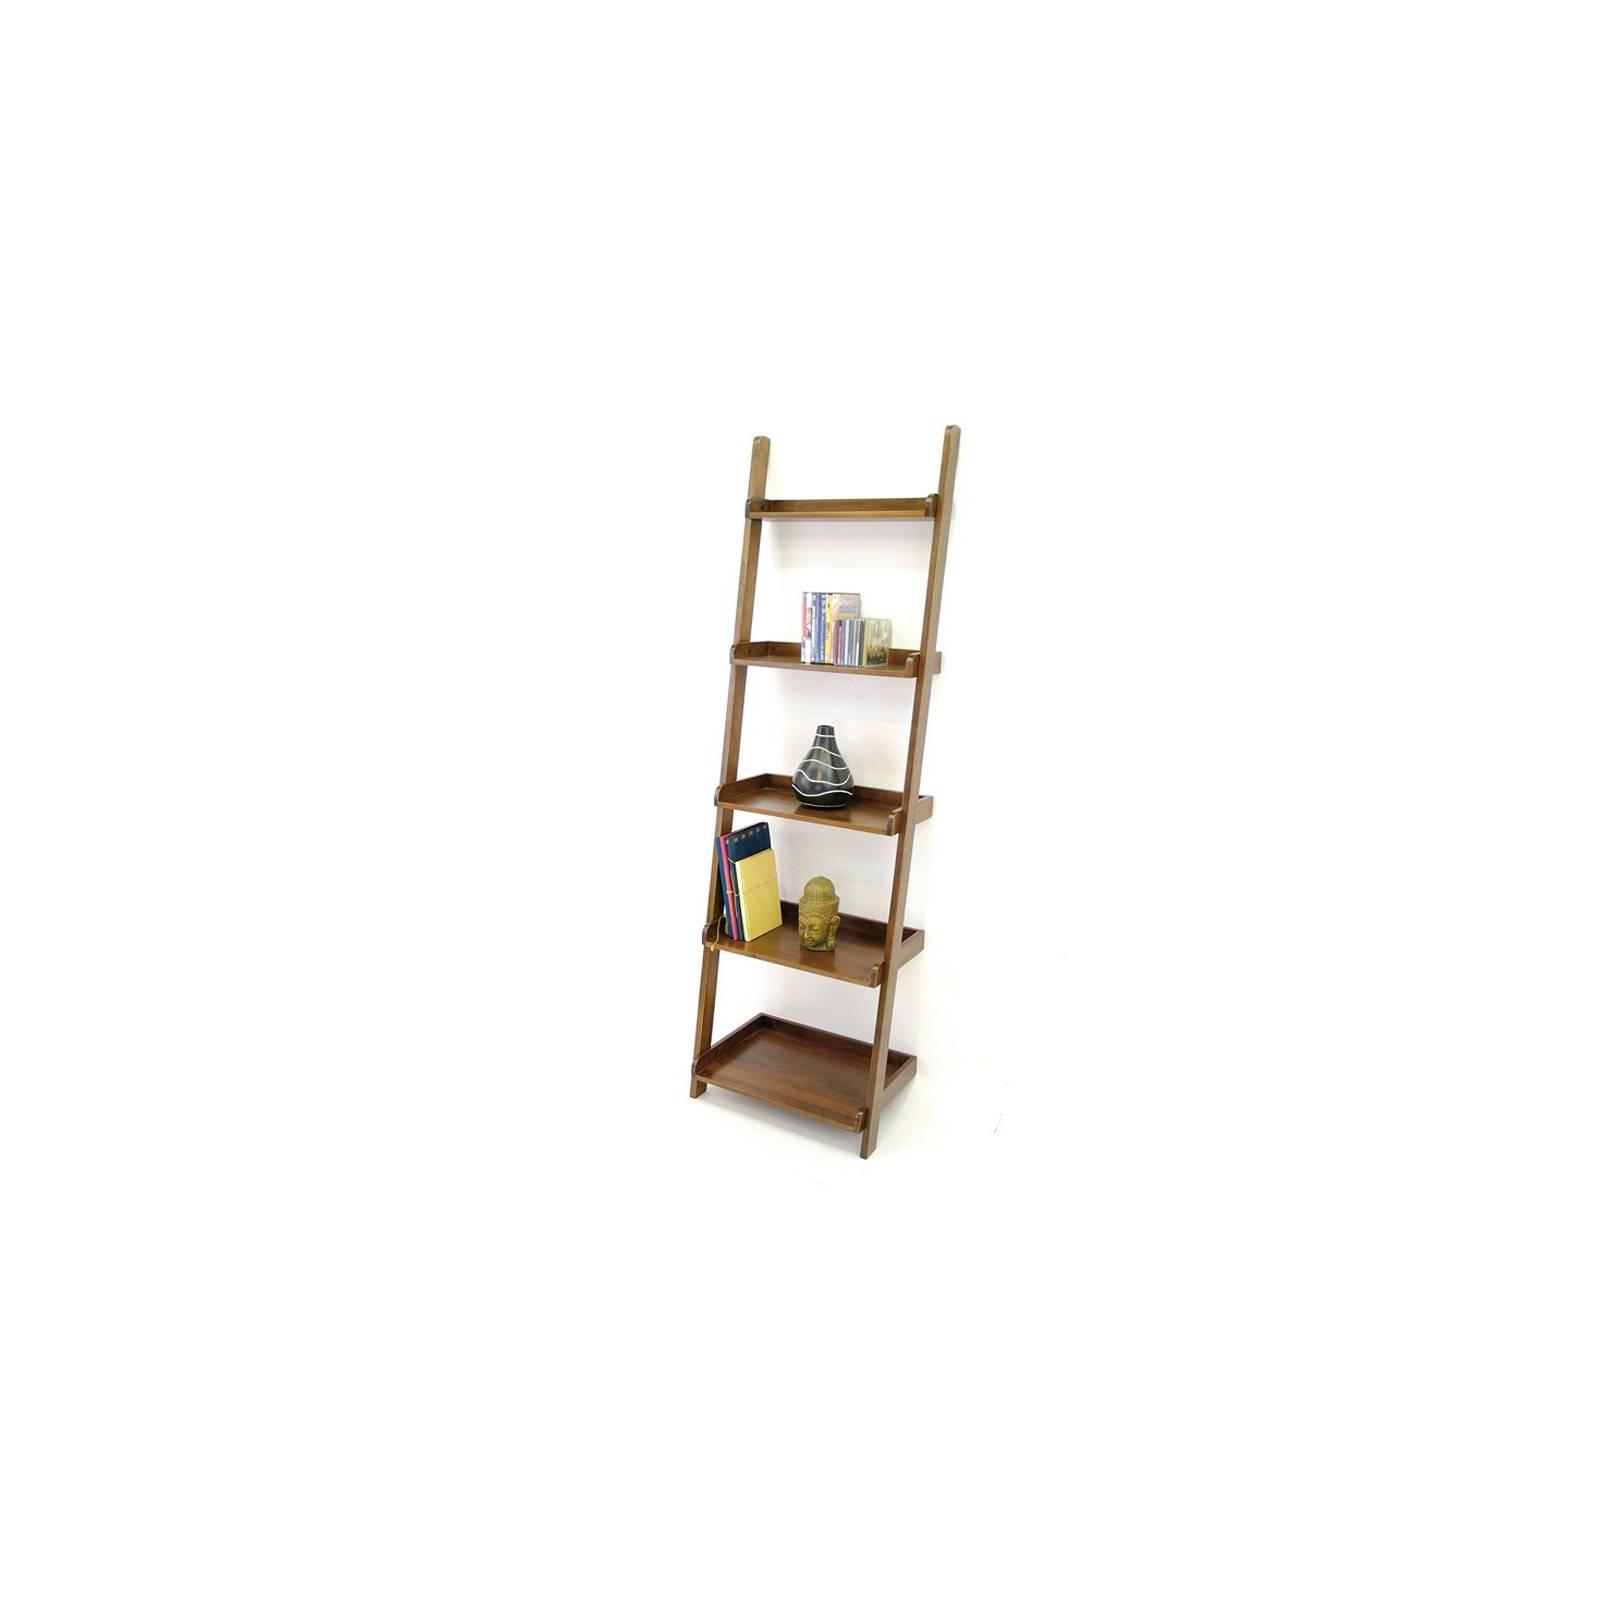 Bibliothèque Echelle Omega Hévéa - meuble style design